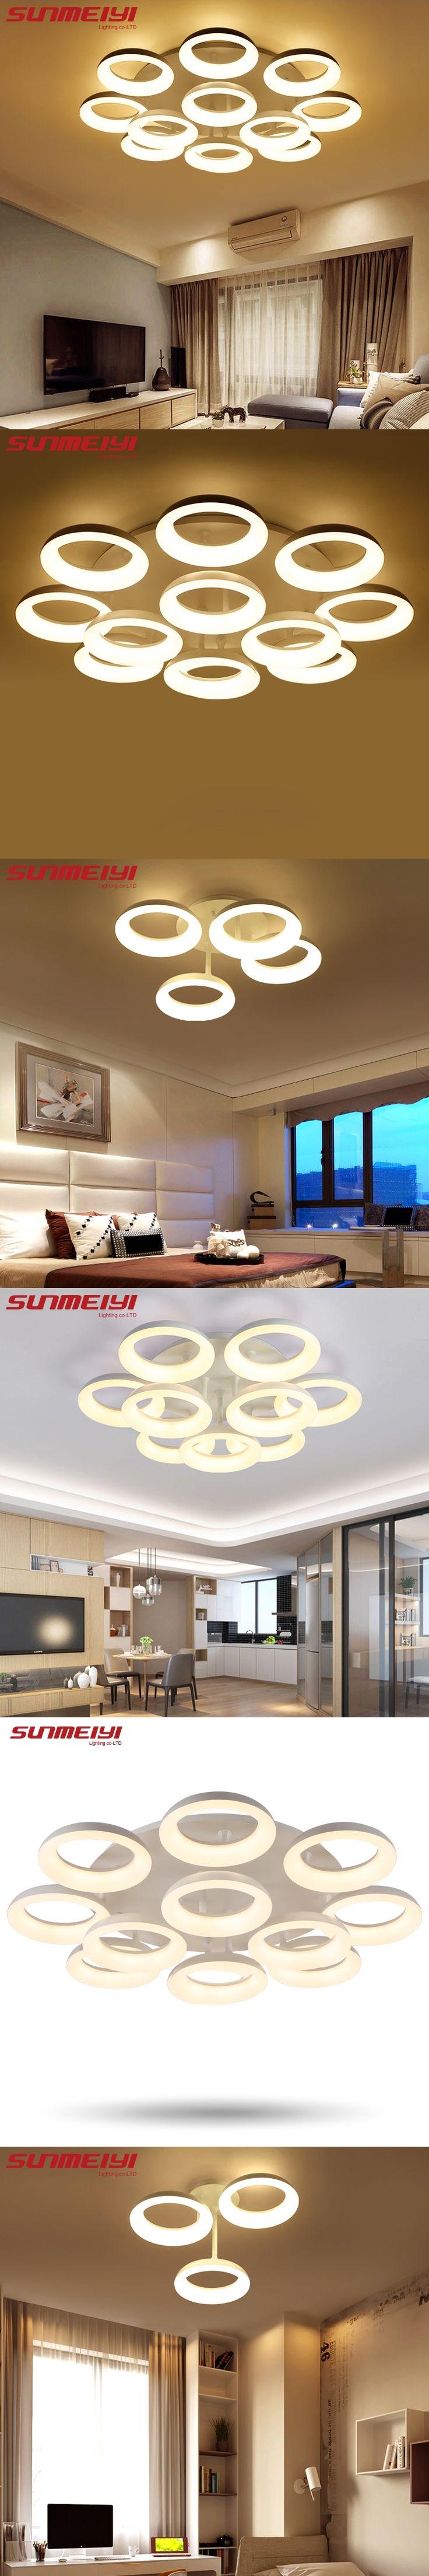 New arrived Modern Ceiling Lights For Living